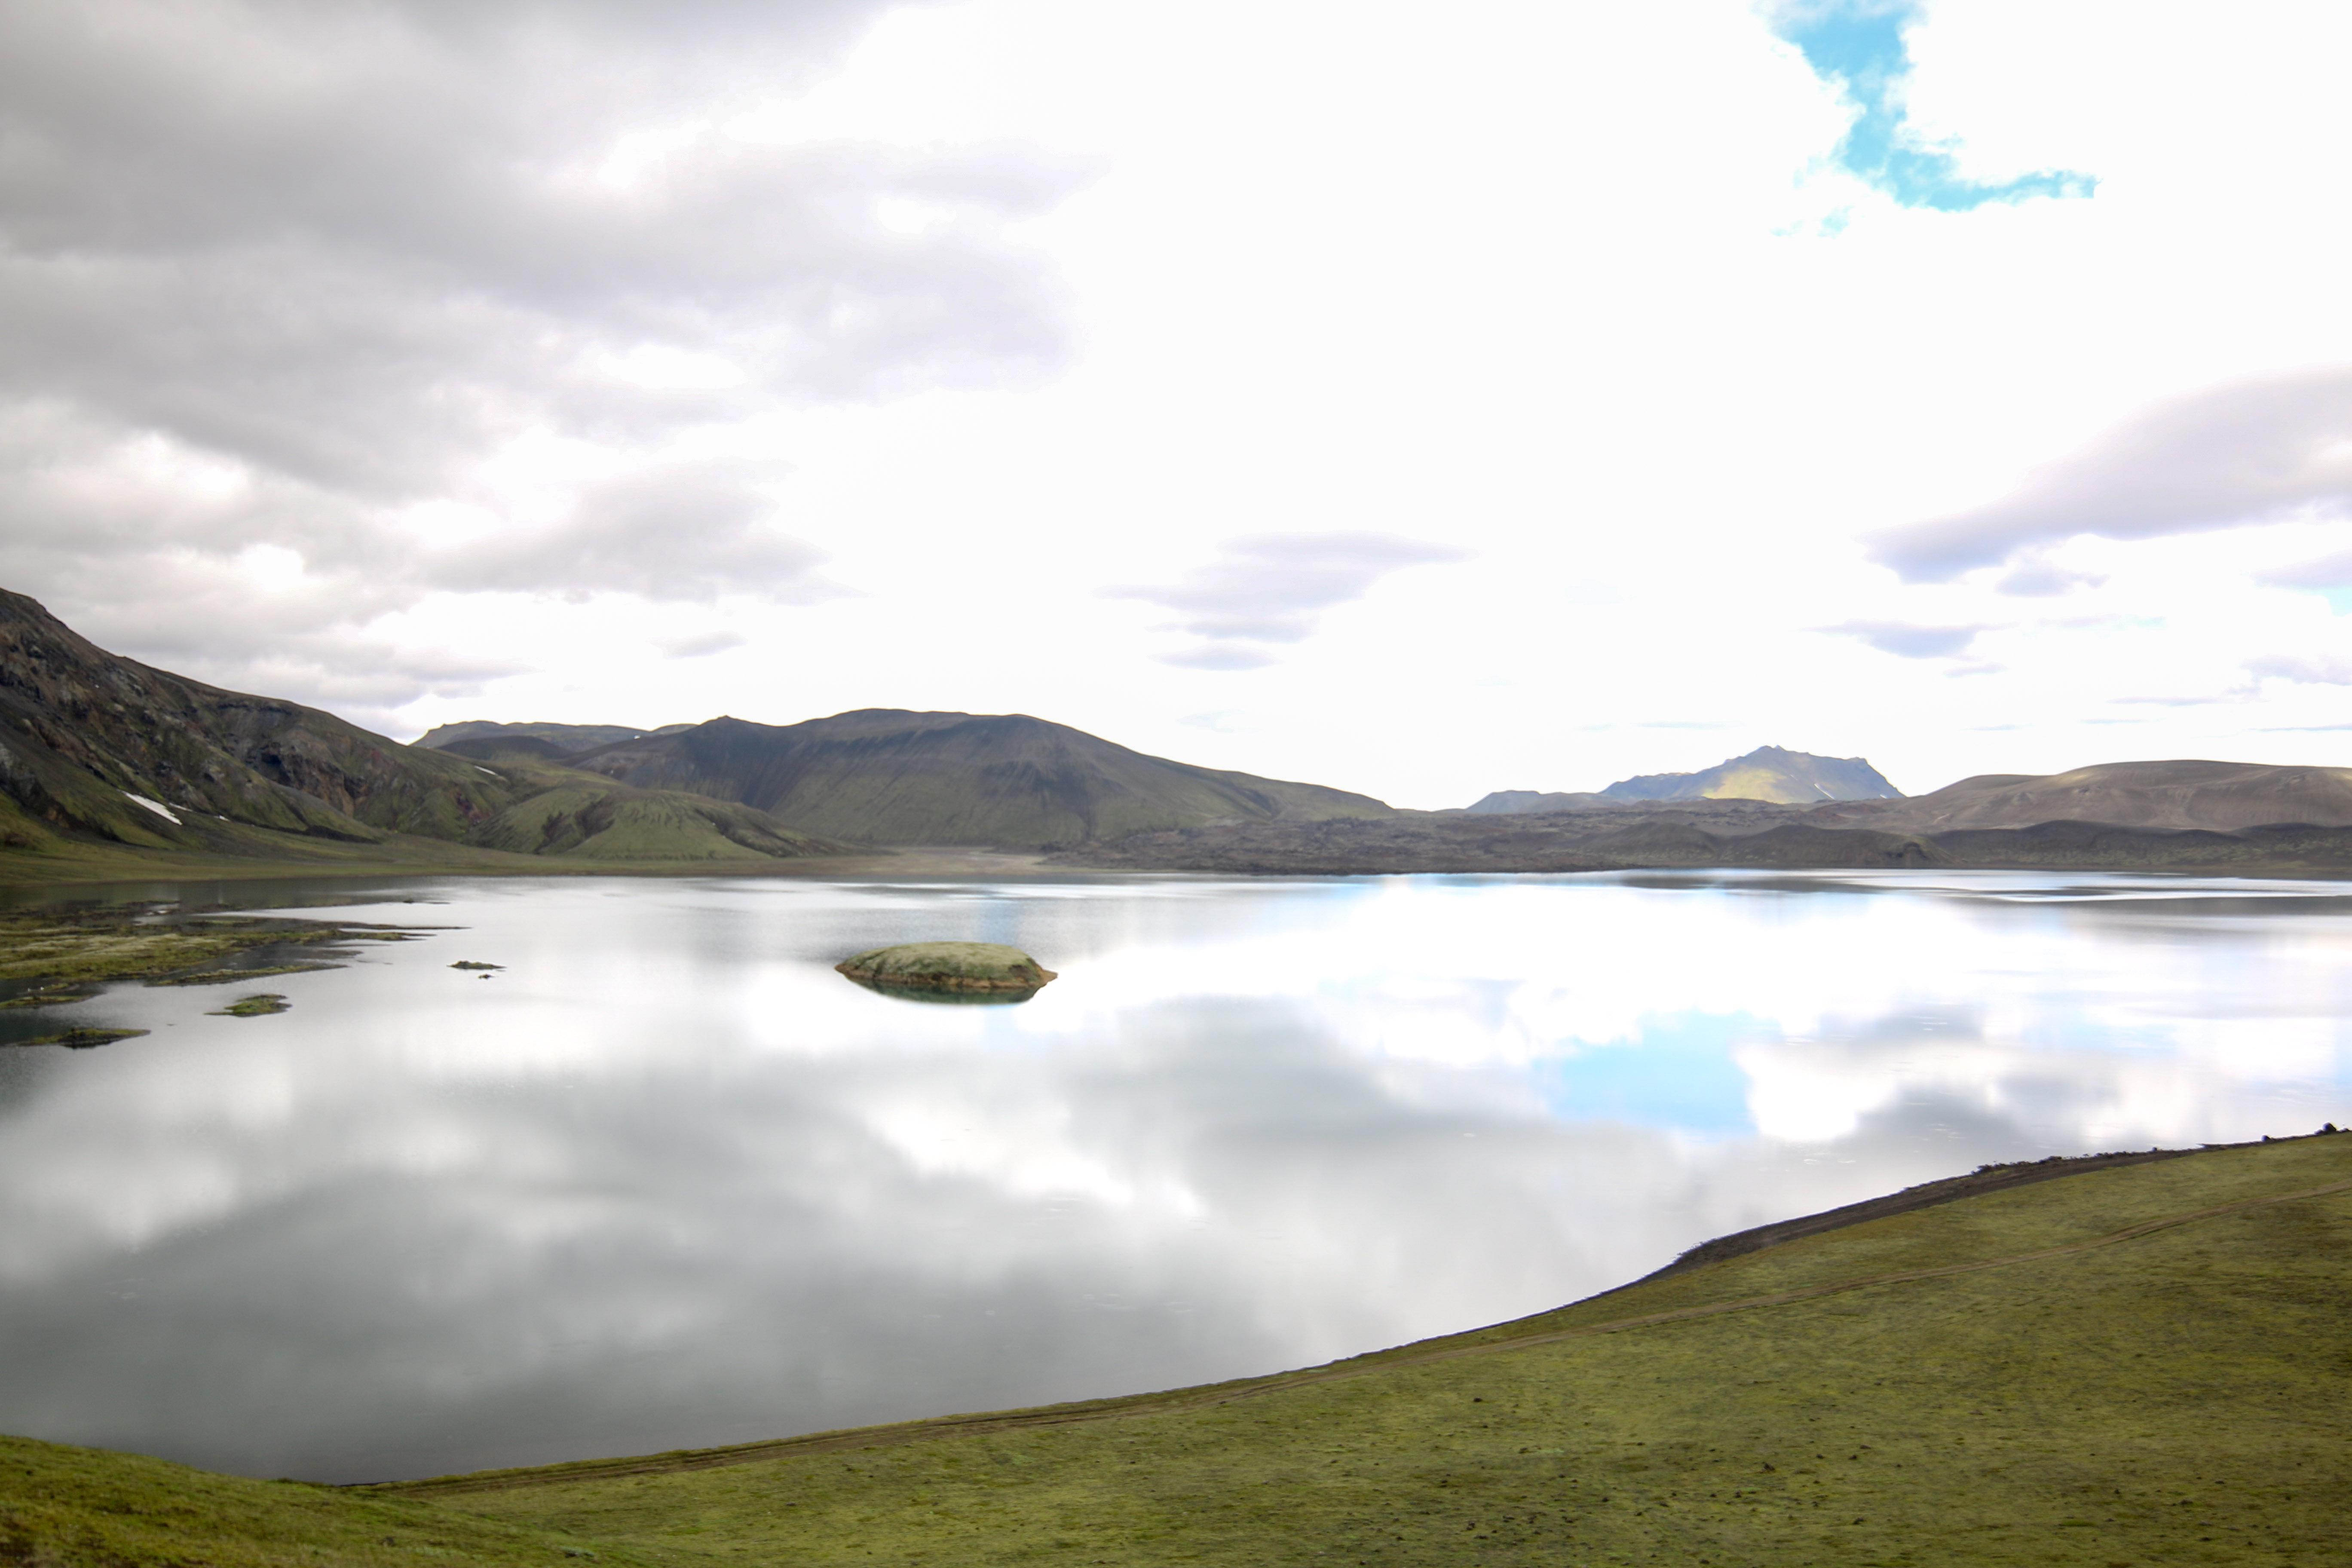 voyage en islande pendant 8 jours avec ma maman I Sp4nkblog_-7